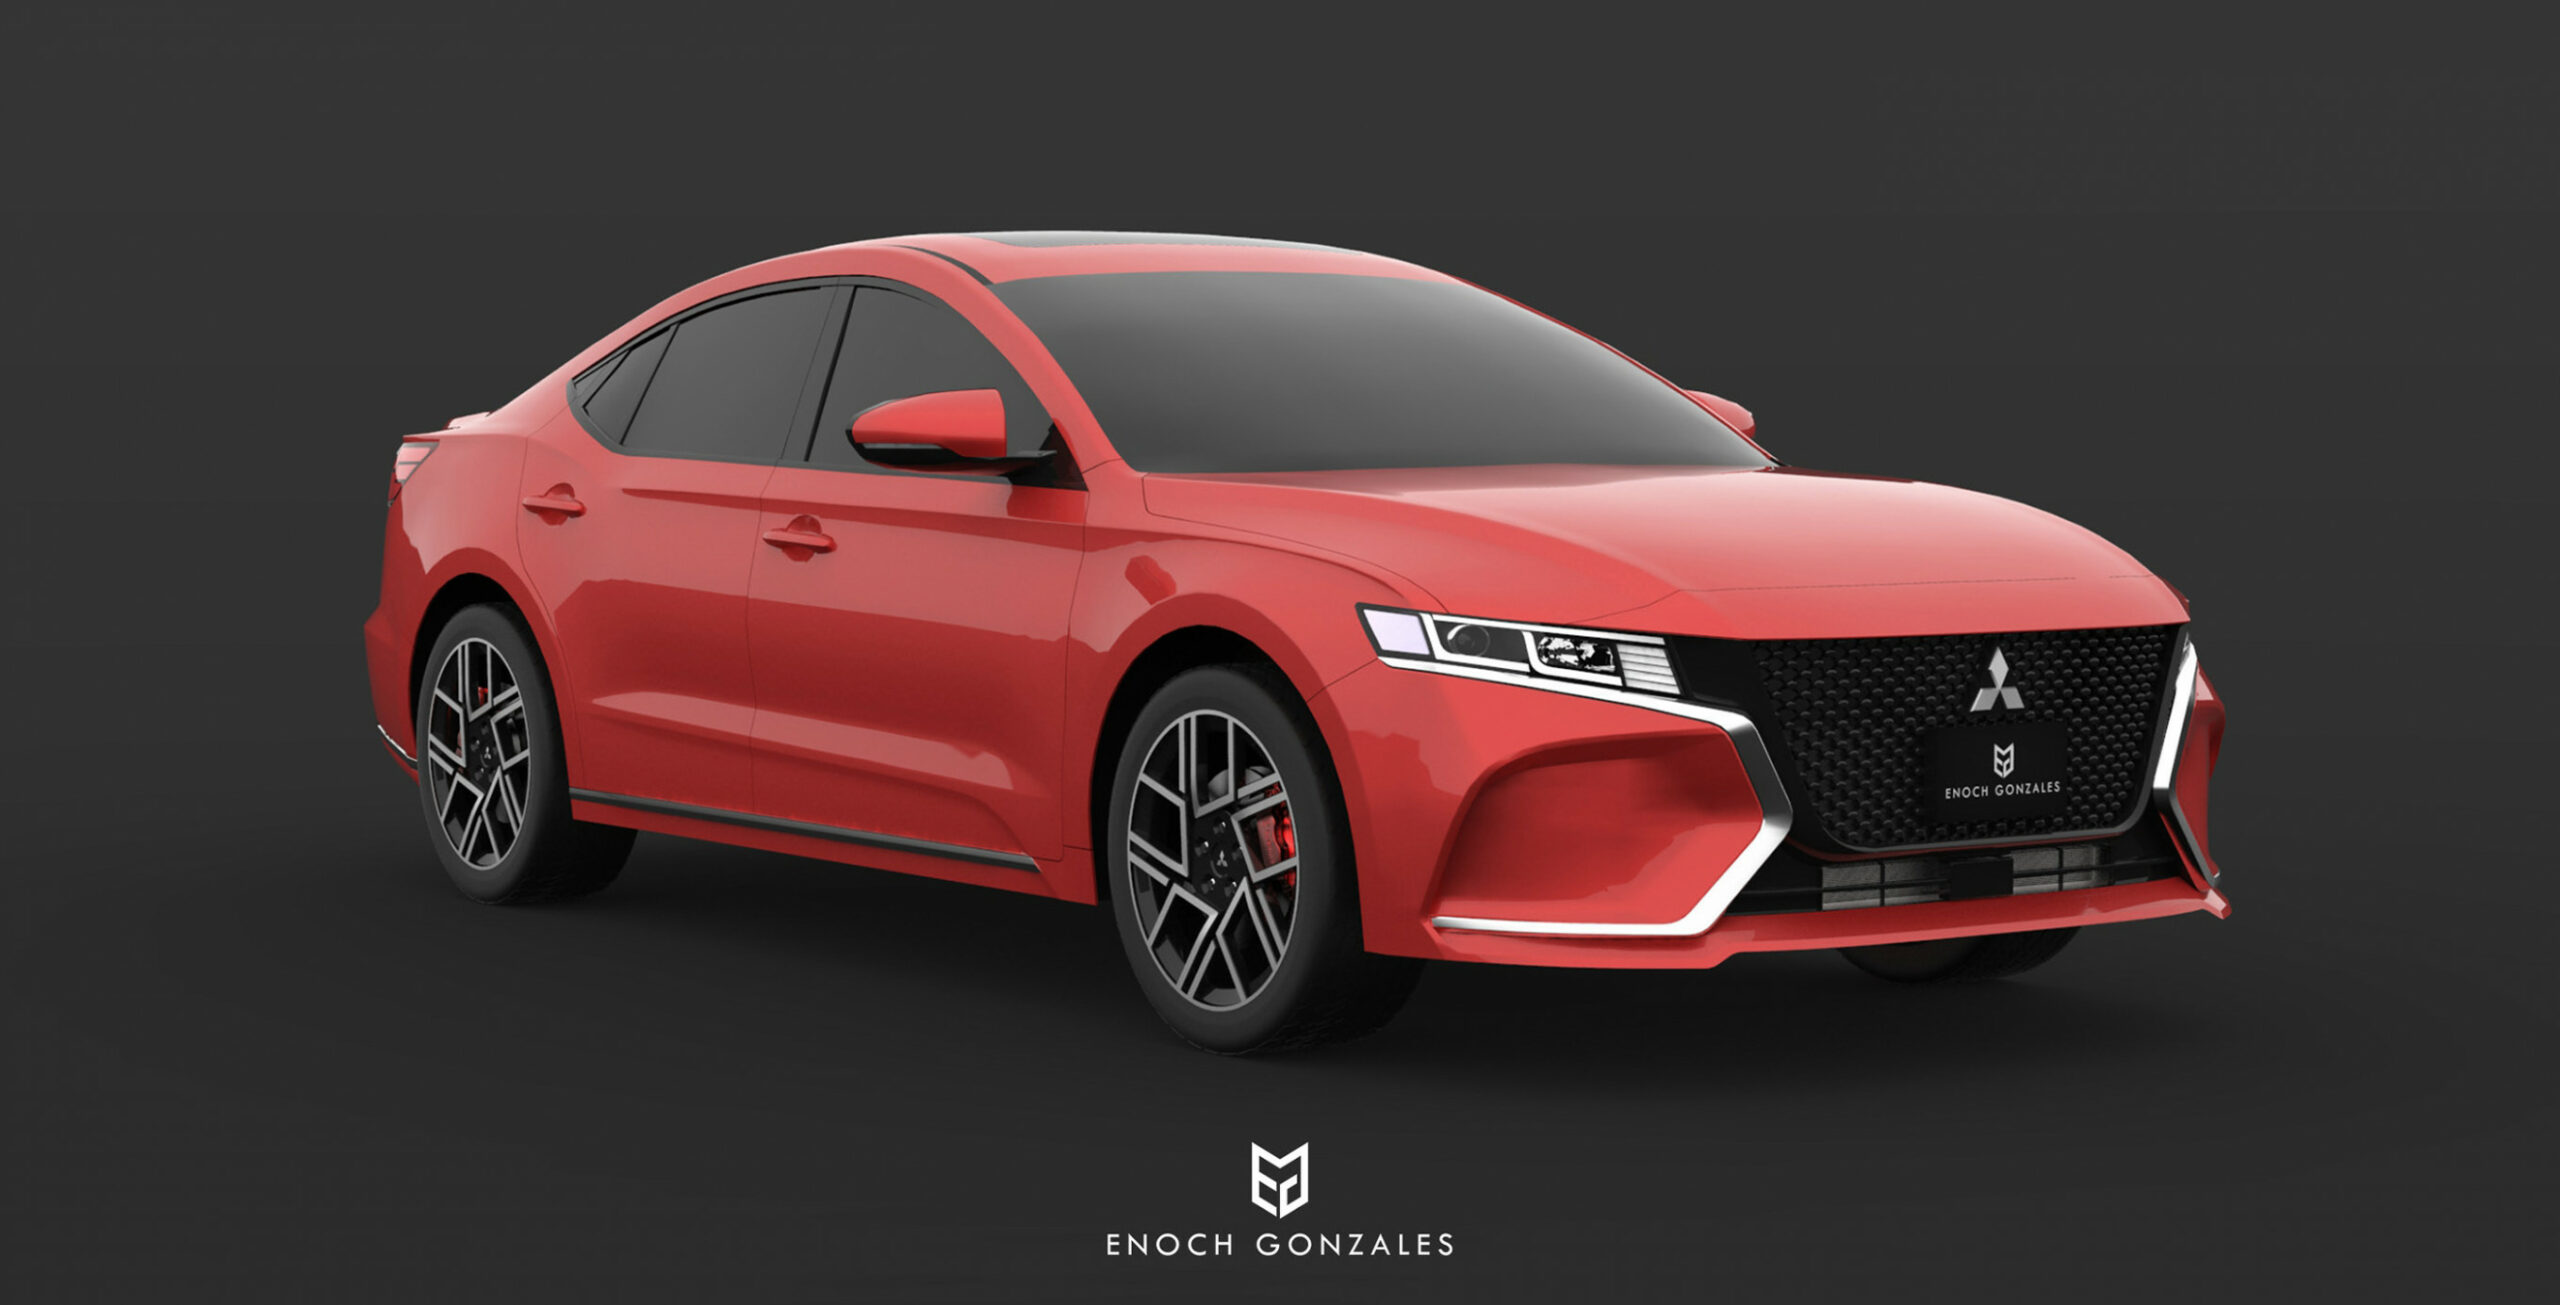 Pricing 2022 Mitsubishi Galant